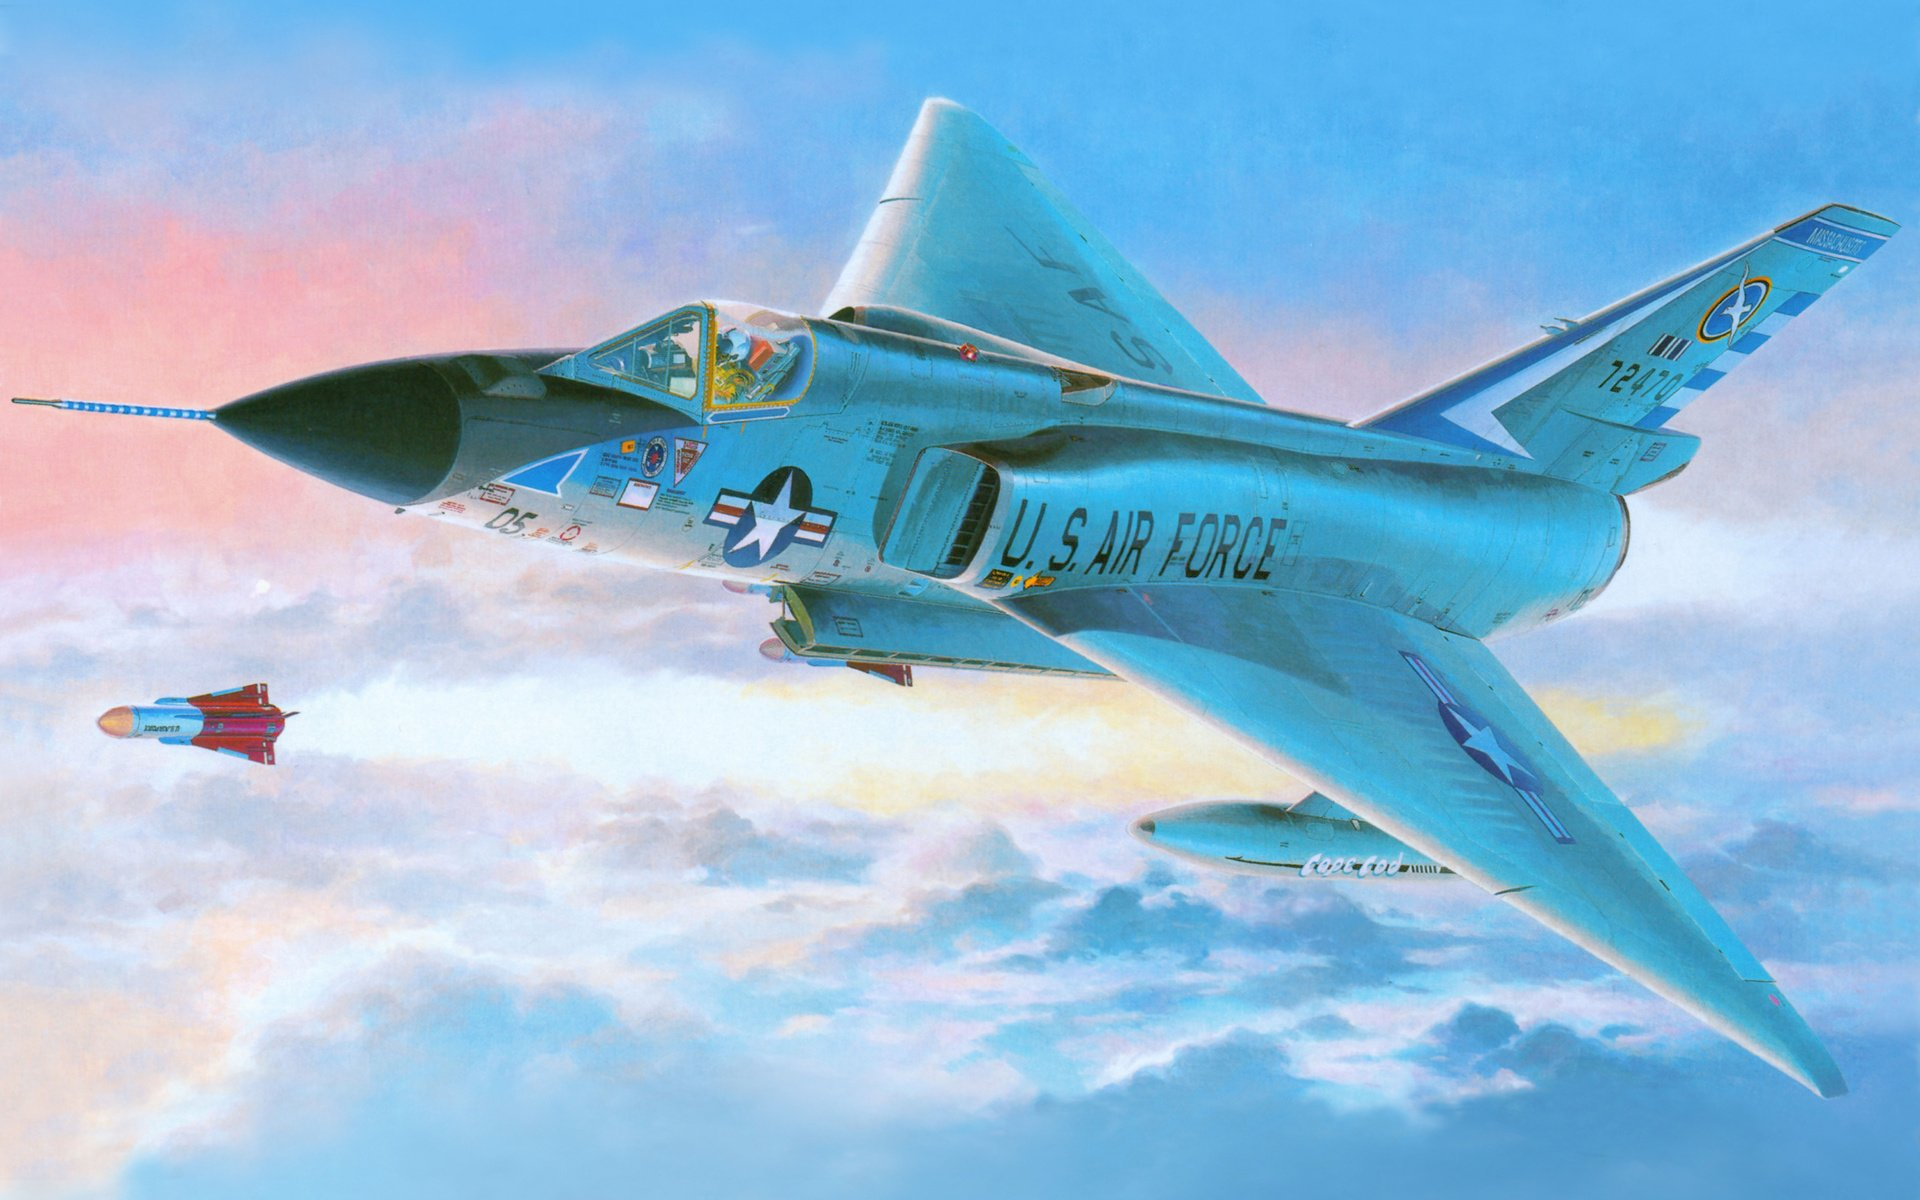 Military - Convair F-106 Delta Dart  Airplane Jet Fighter Fly Wallpaper